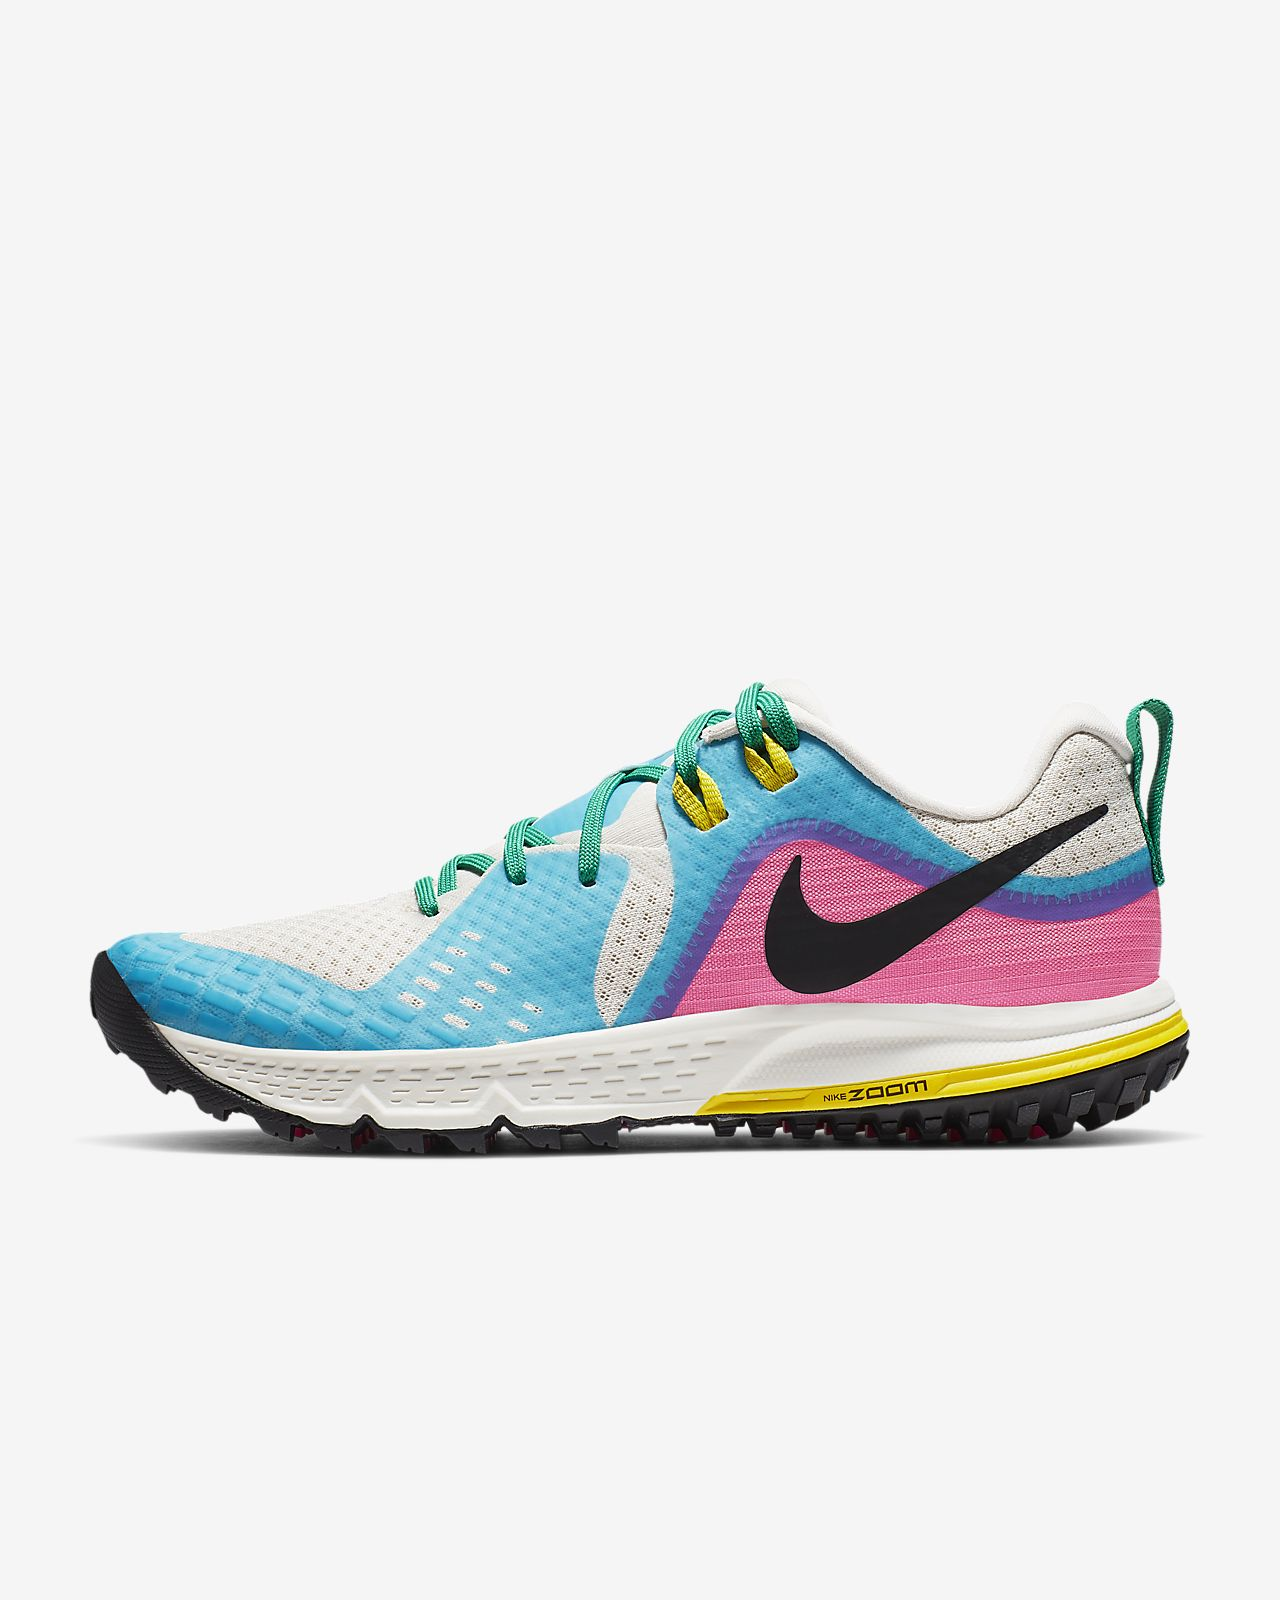 Nike Air Zoom Wildhorse 5 Damen-Laufschuh